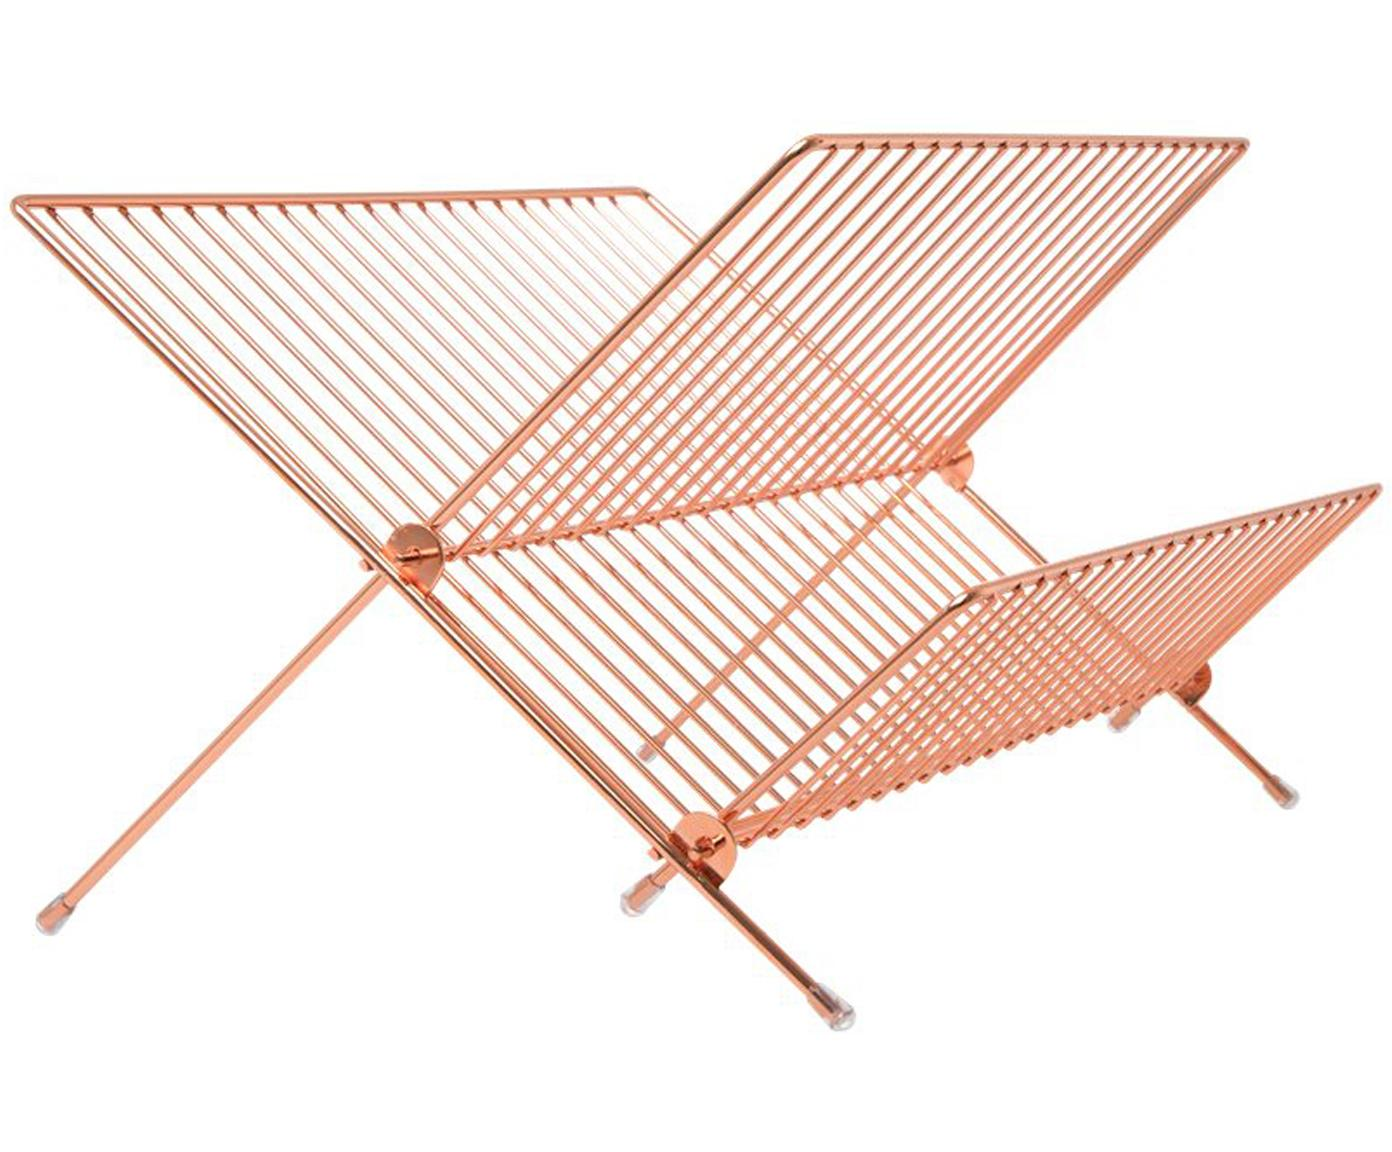 Abtropfgestell Nella, Metall, beschichtet, Roségoldfarben, 39 x 22 cm